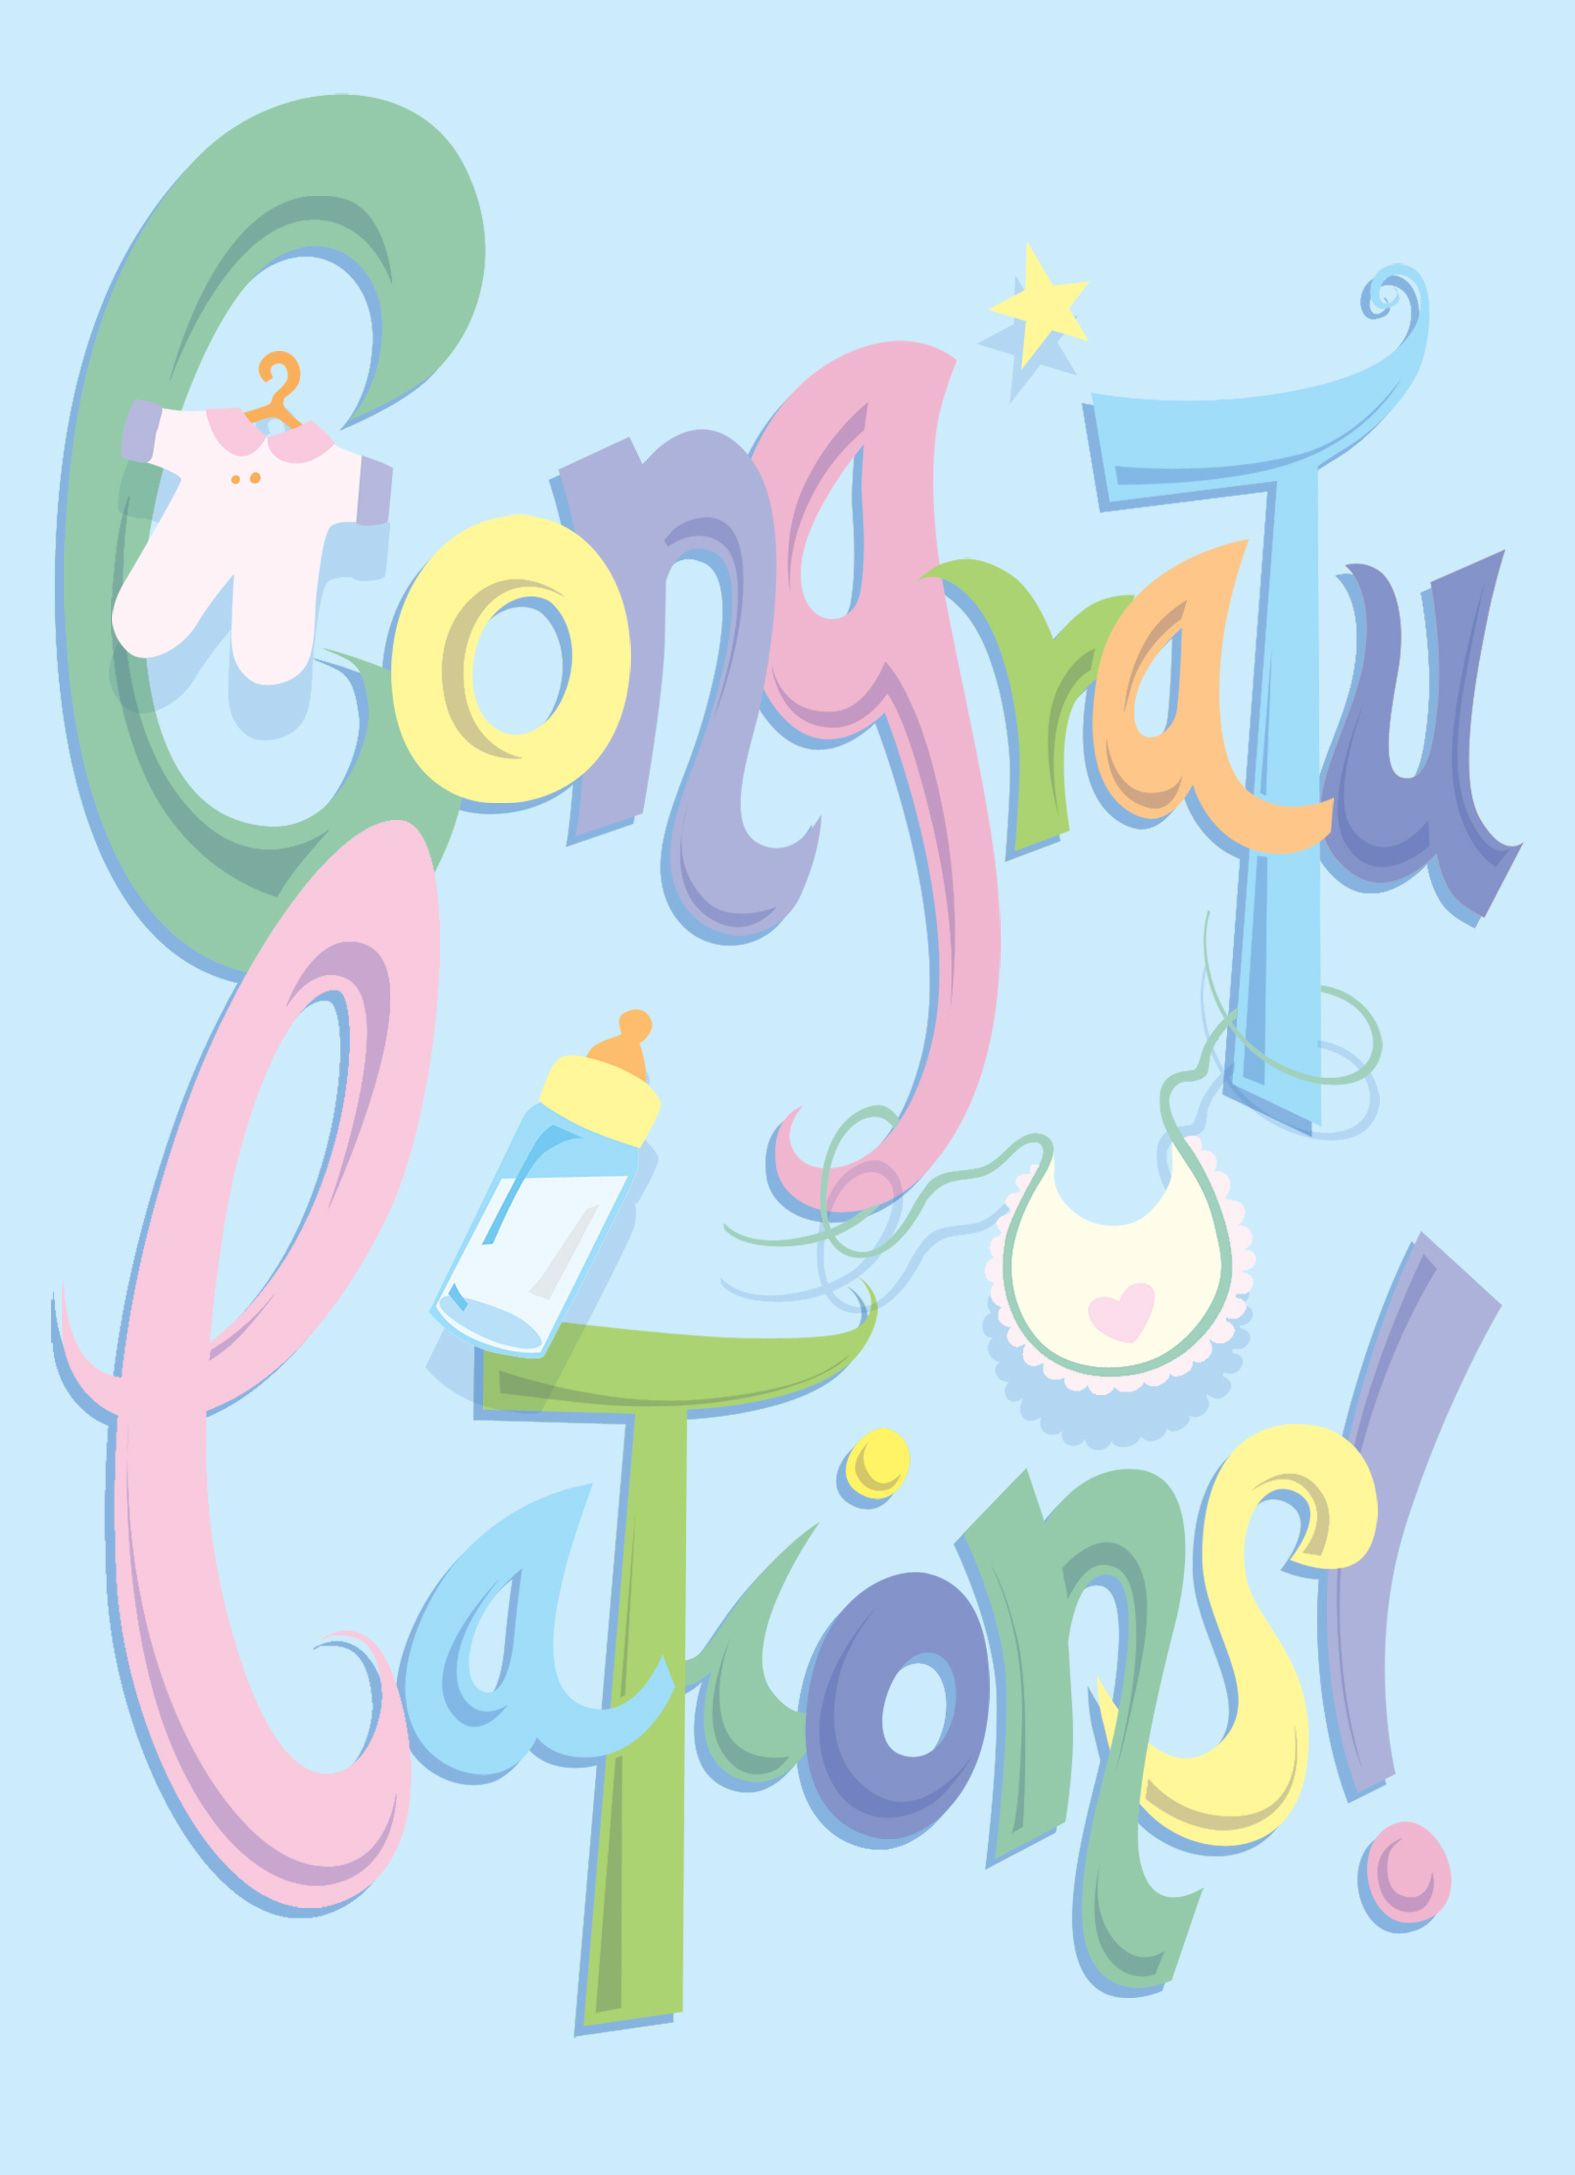 Medium Crop Of Congrats On Baby